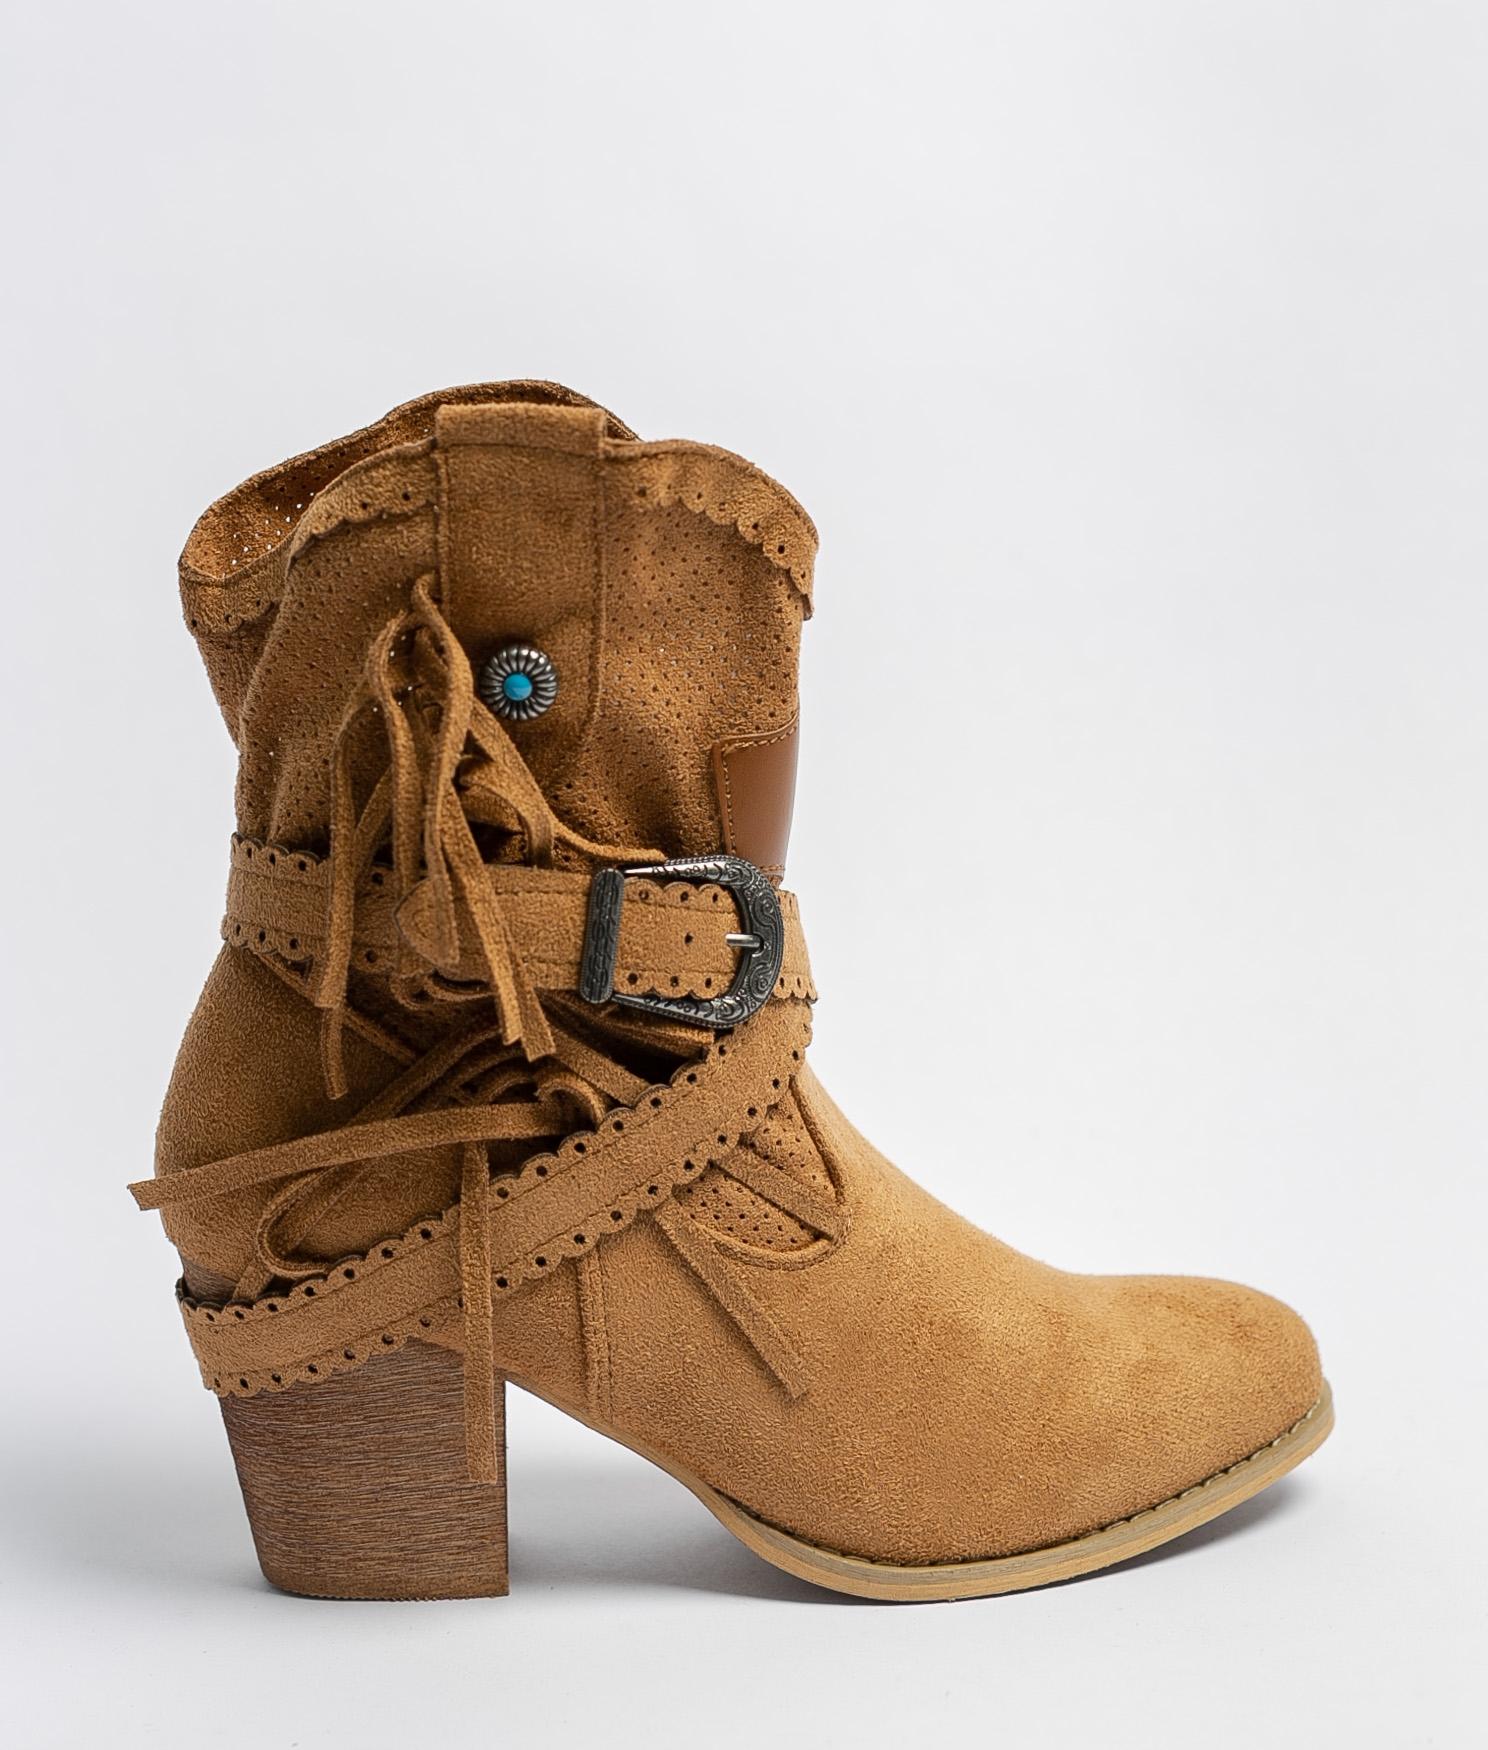 Bemus Low Boot - Camel